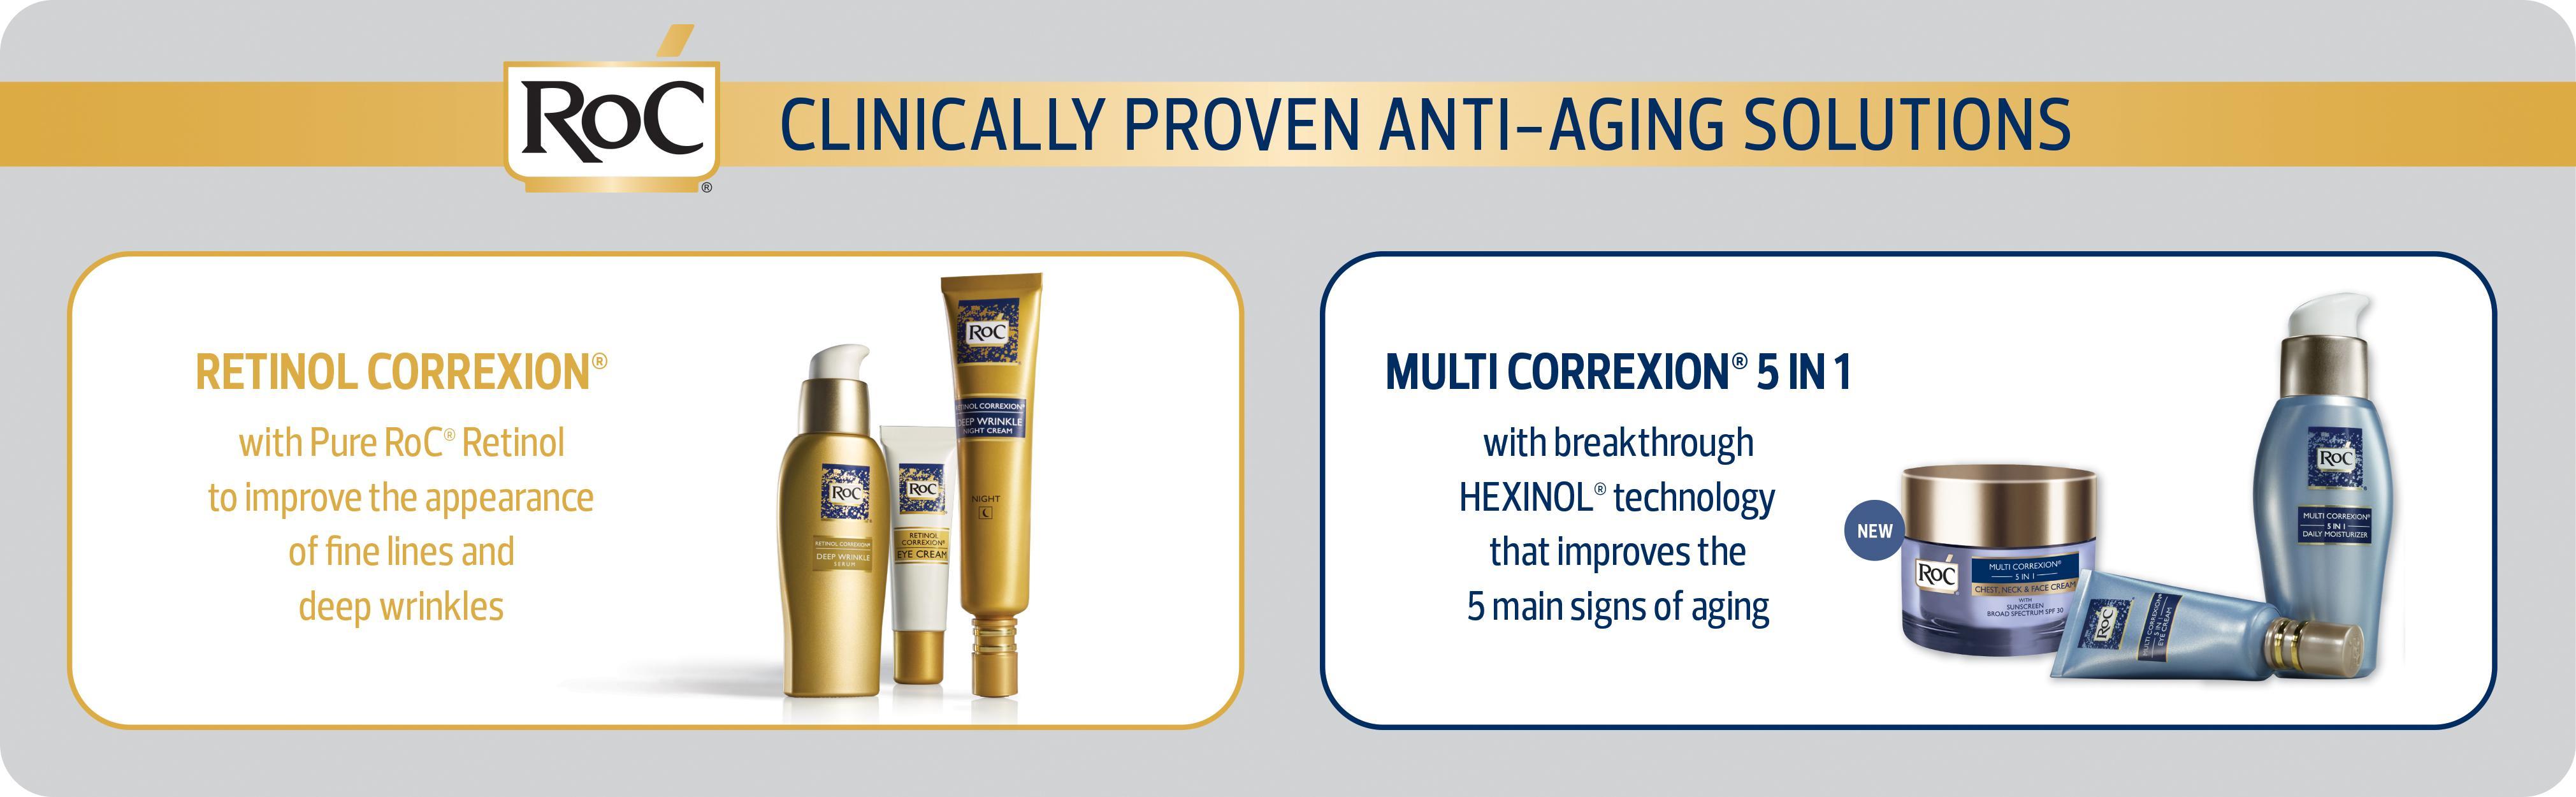 Amazon.com: RoC Retinol Correxion Deep Wrinkle Repair Pack: Beauty